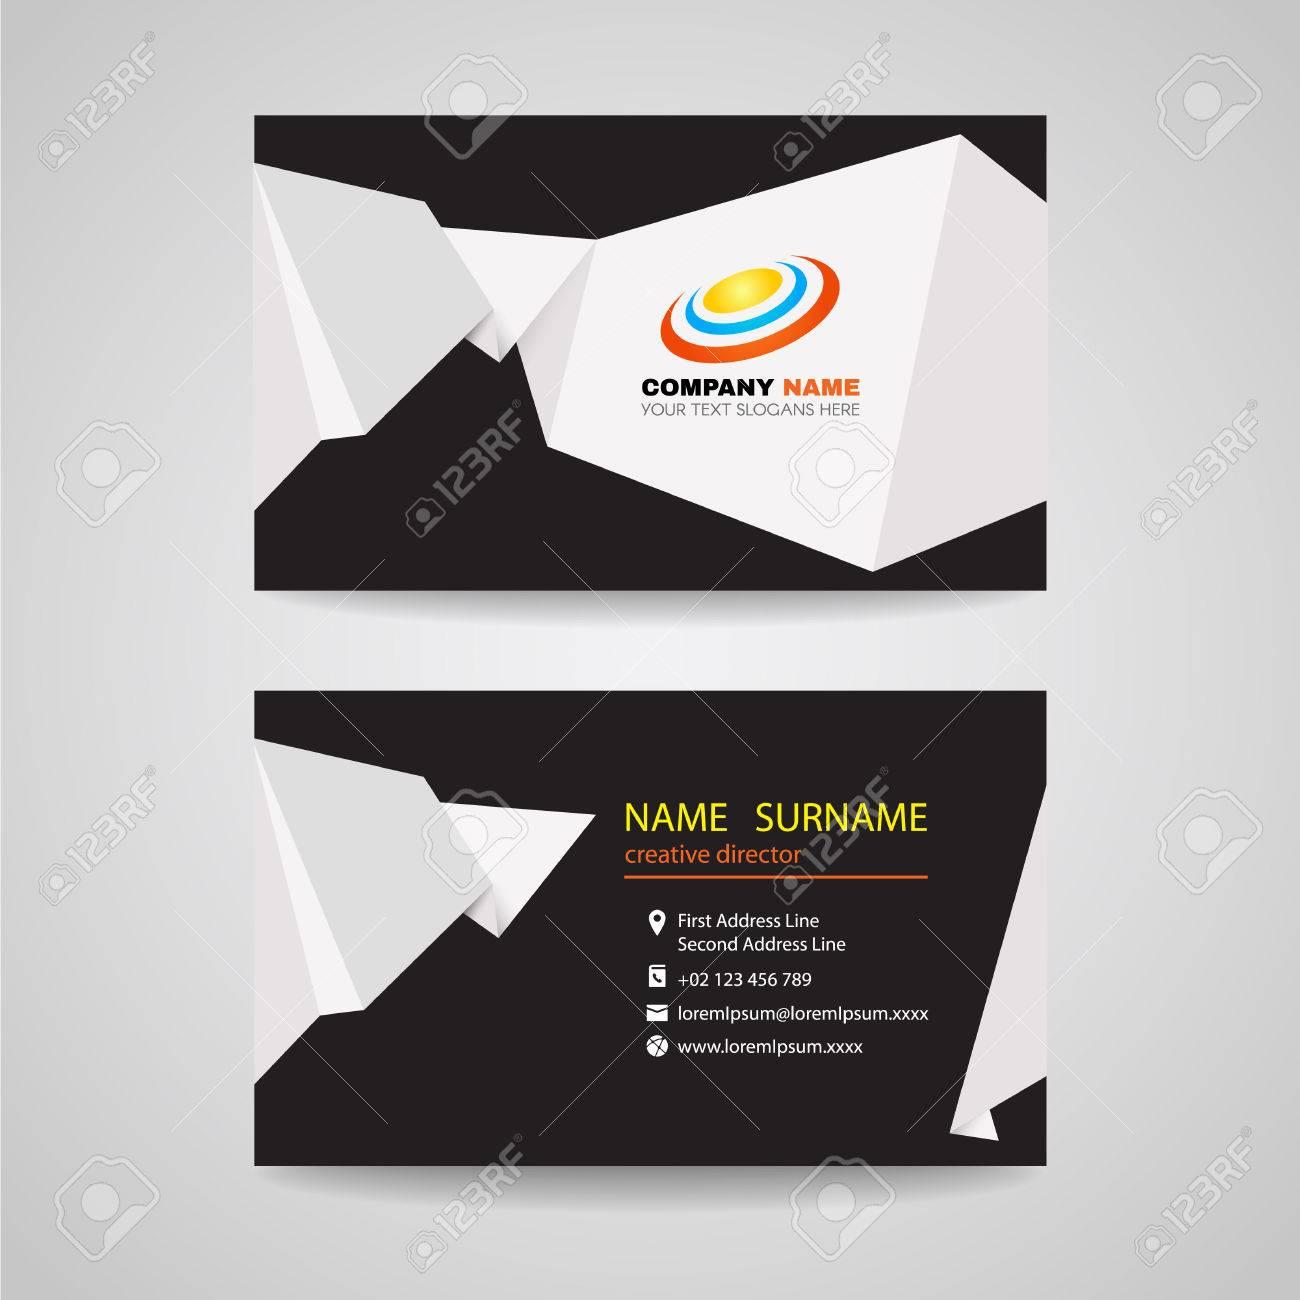 Business card vector design white sharp origami paper on black business card vector design white sharp origami paper on black background stock vector 45010589 reheart Choice Image